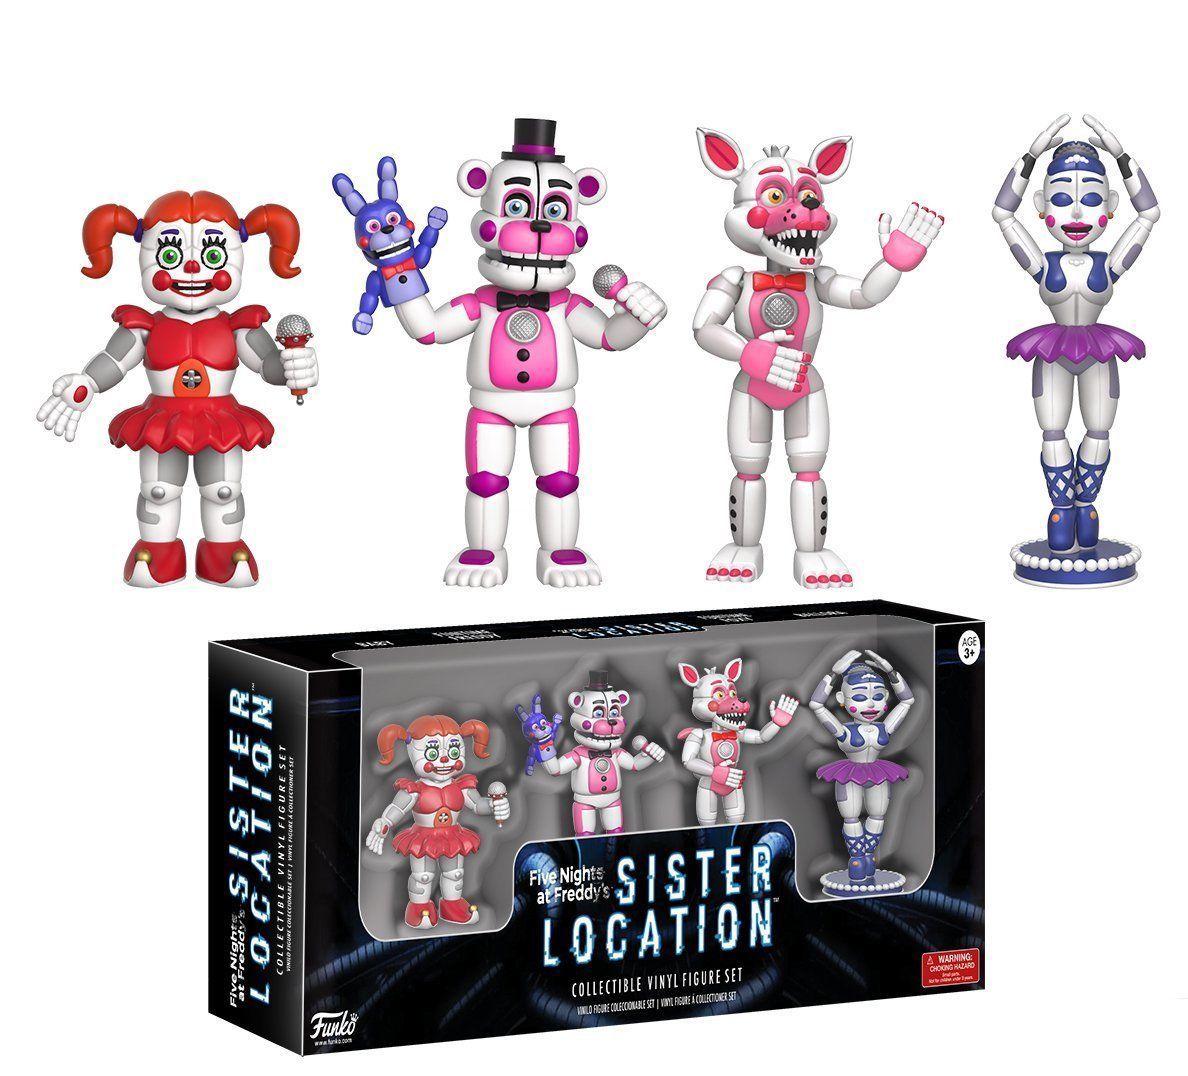 1313 Funko Five Nights At Freddys Sister Location 4 Pack Set 2 Bott Pop Fnaf Freddy Vinyl Action Figures Ebay Collectibles